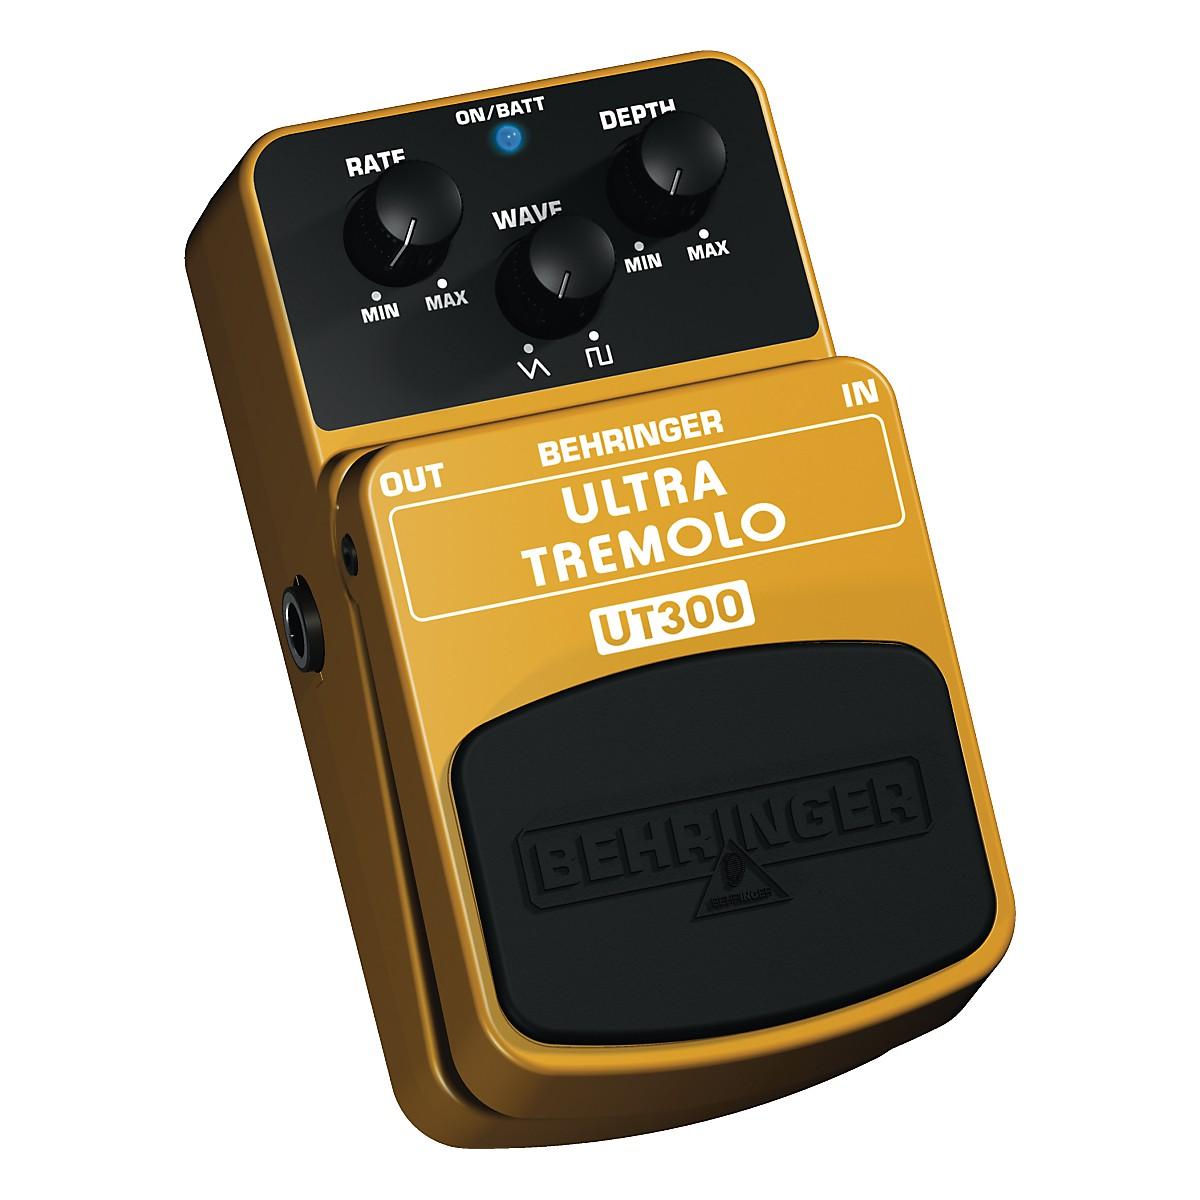 Behringer Ultra Tremolo UT300 Classic Tremolo Effects Pedal